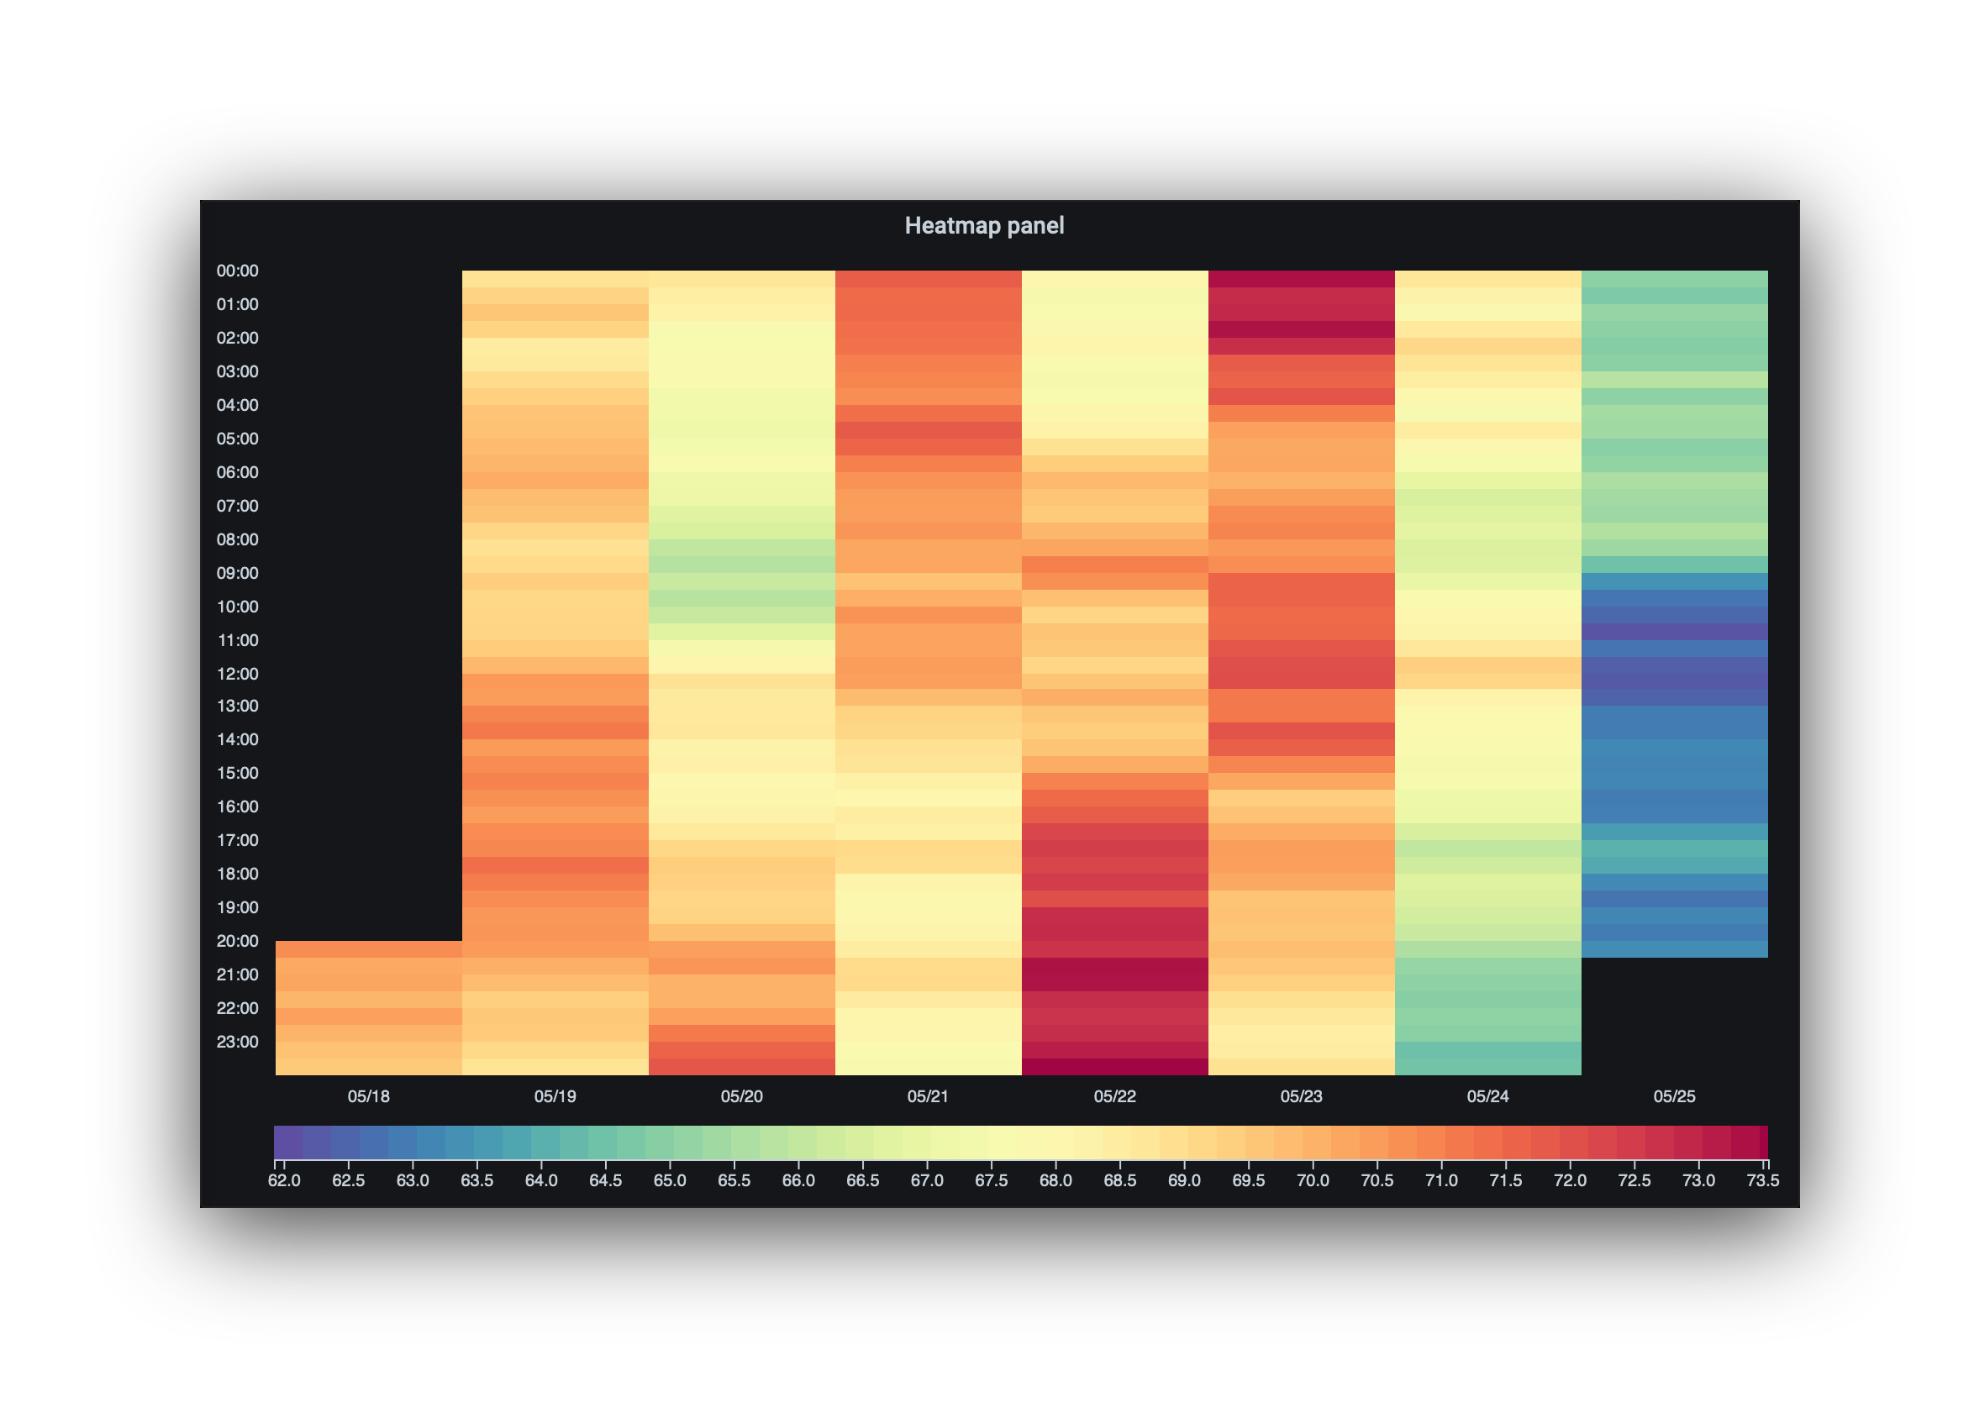 <Hourly heatmap>